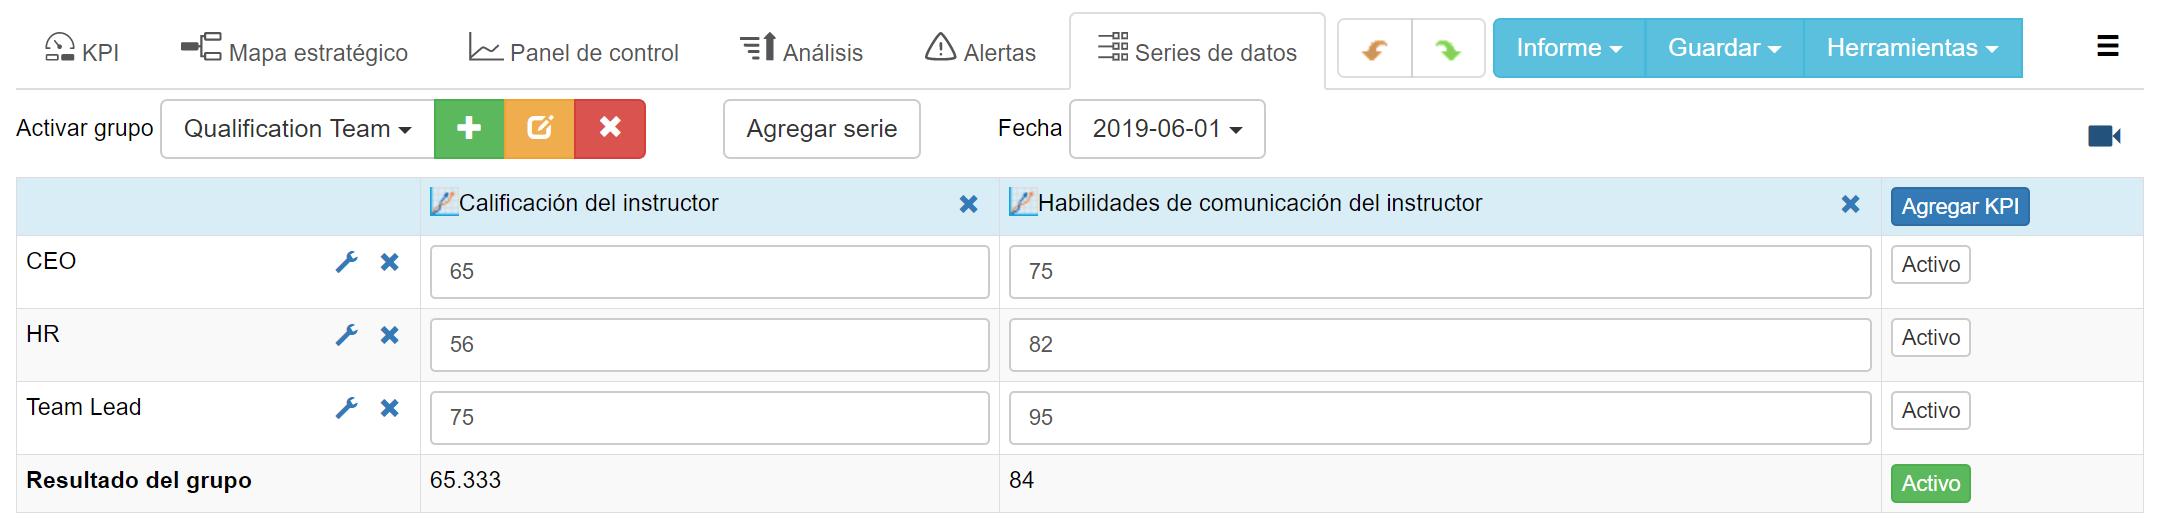 Equipo de clasificación de series de datos